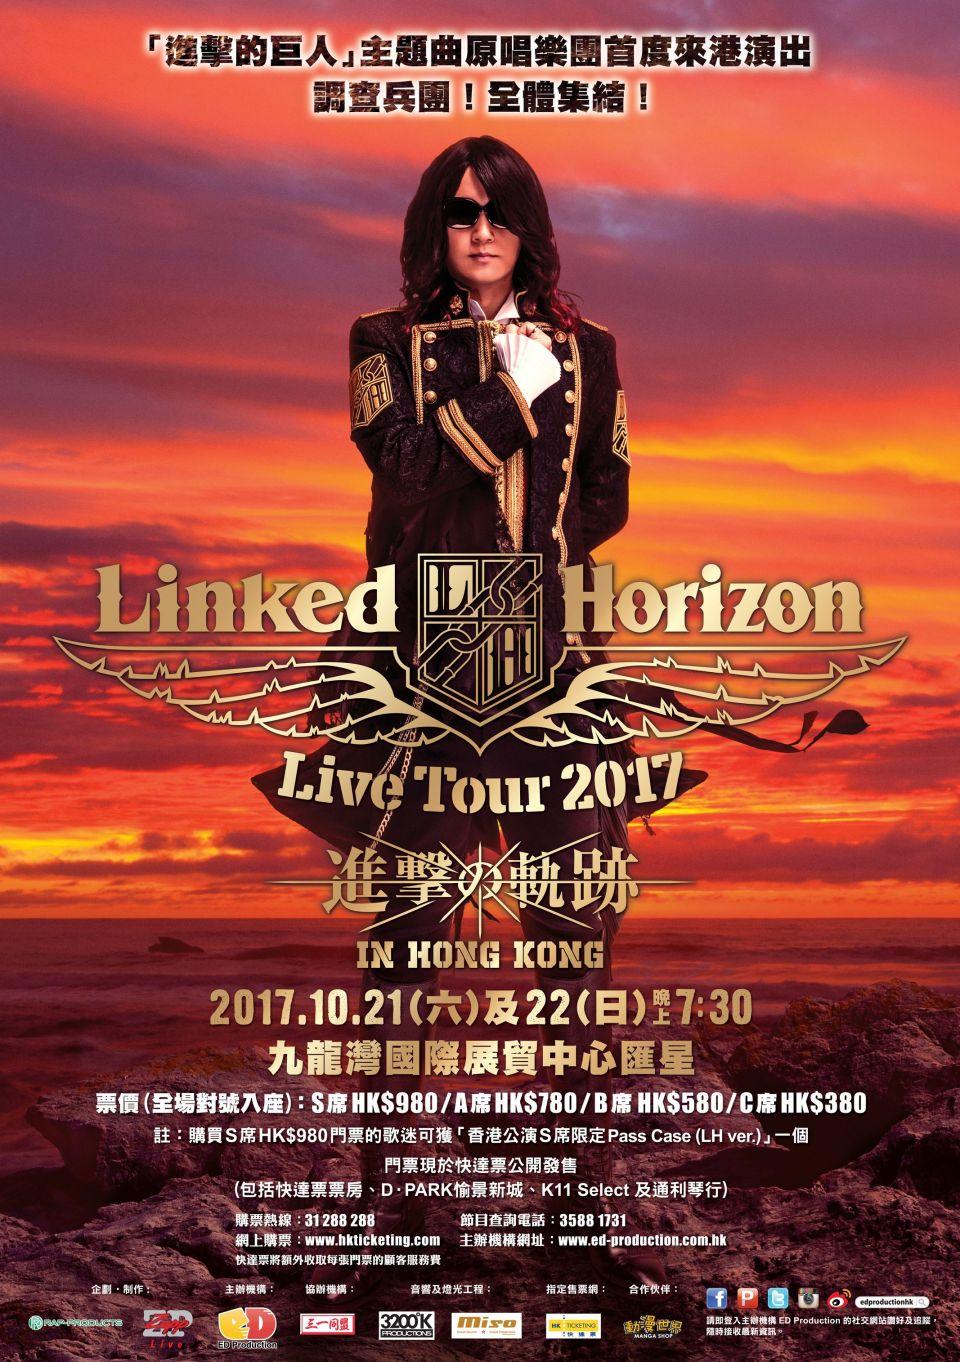 Linked Horizon 即將首次登陸香港!!   「Linked Horizon Live Tour 2017 進擊的軌跡 in Hong Kong」